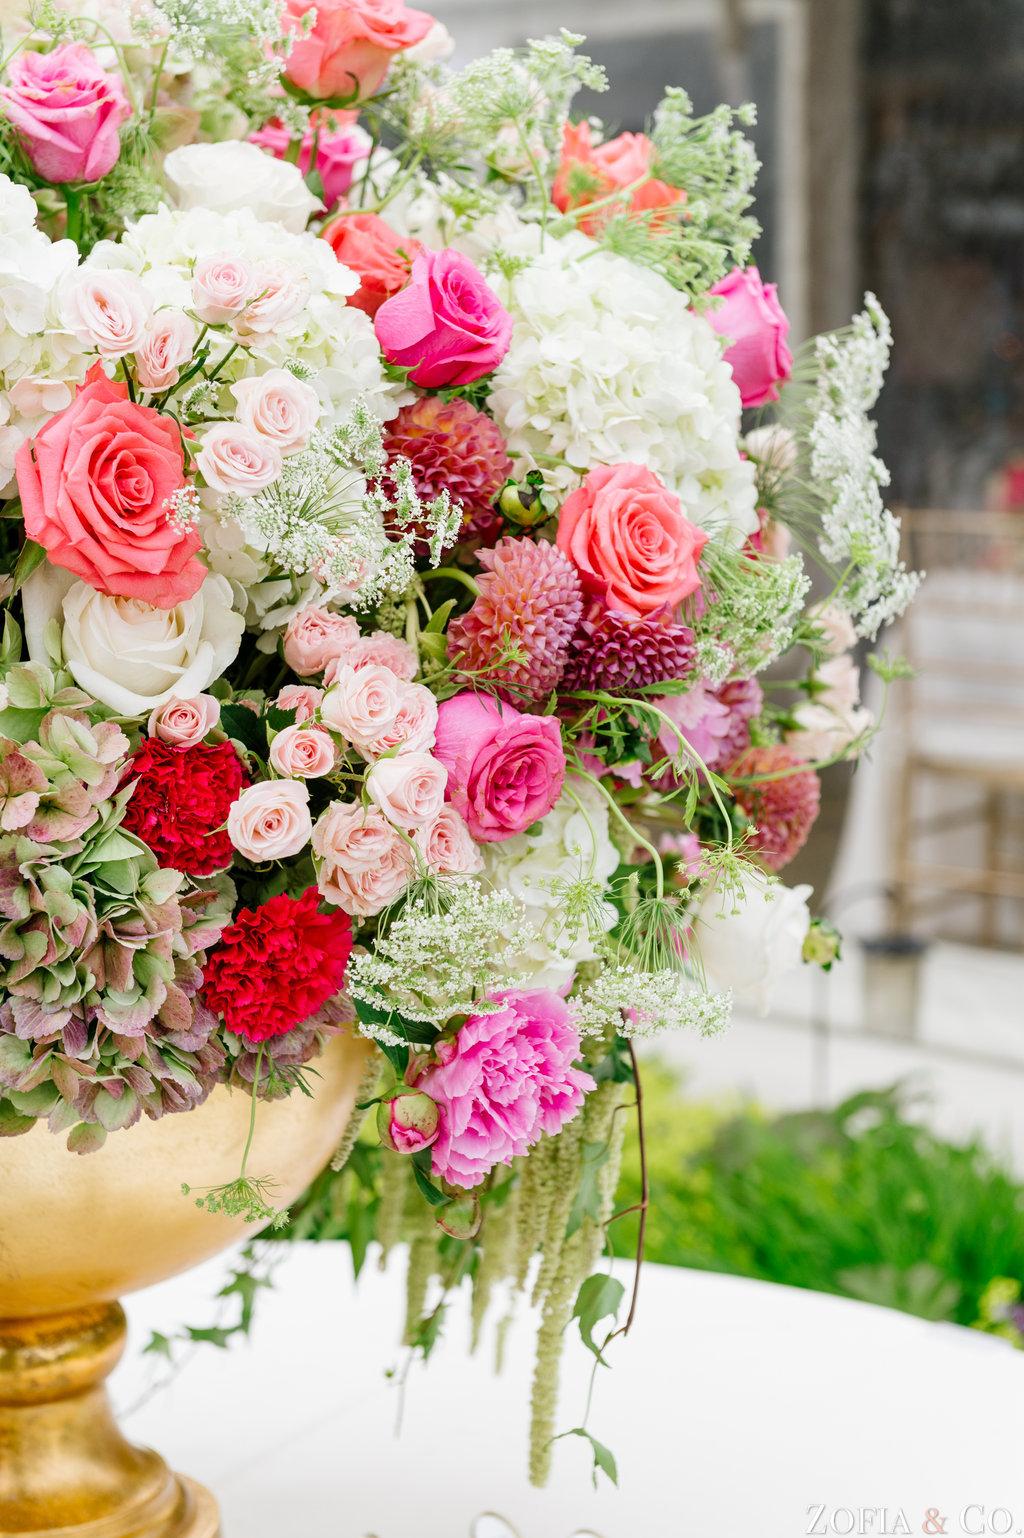 Ceci_New_York_Style_Luxury_Custom_Summer_Wedding_CeciBride_Nautical_Blue_Gold_Letterpress_Foil_208.jpg